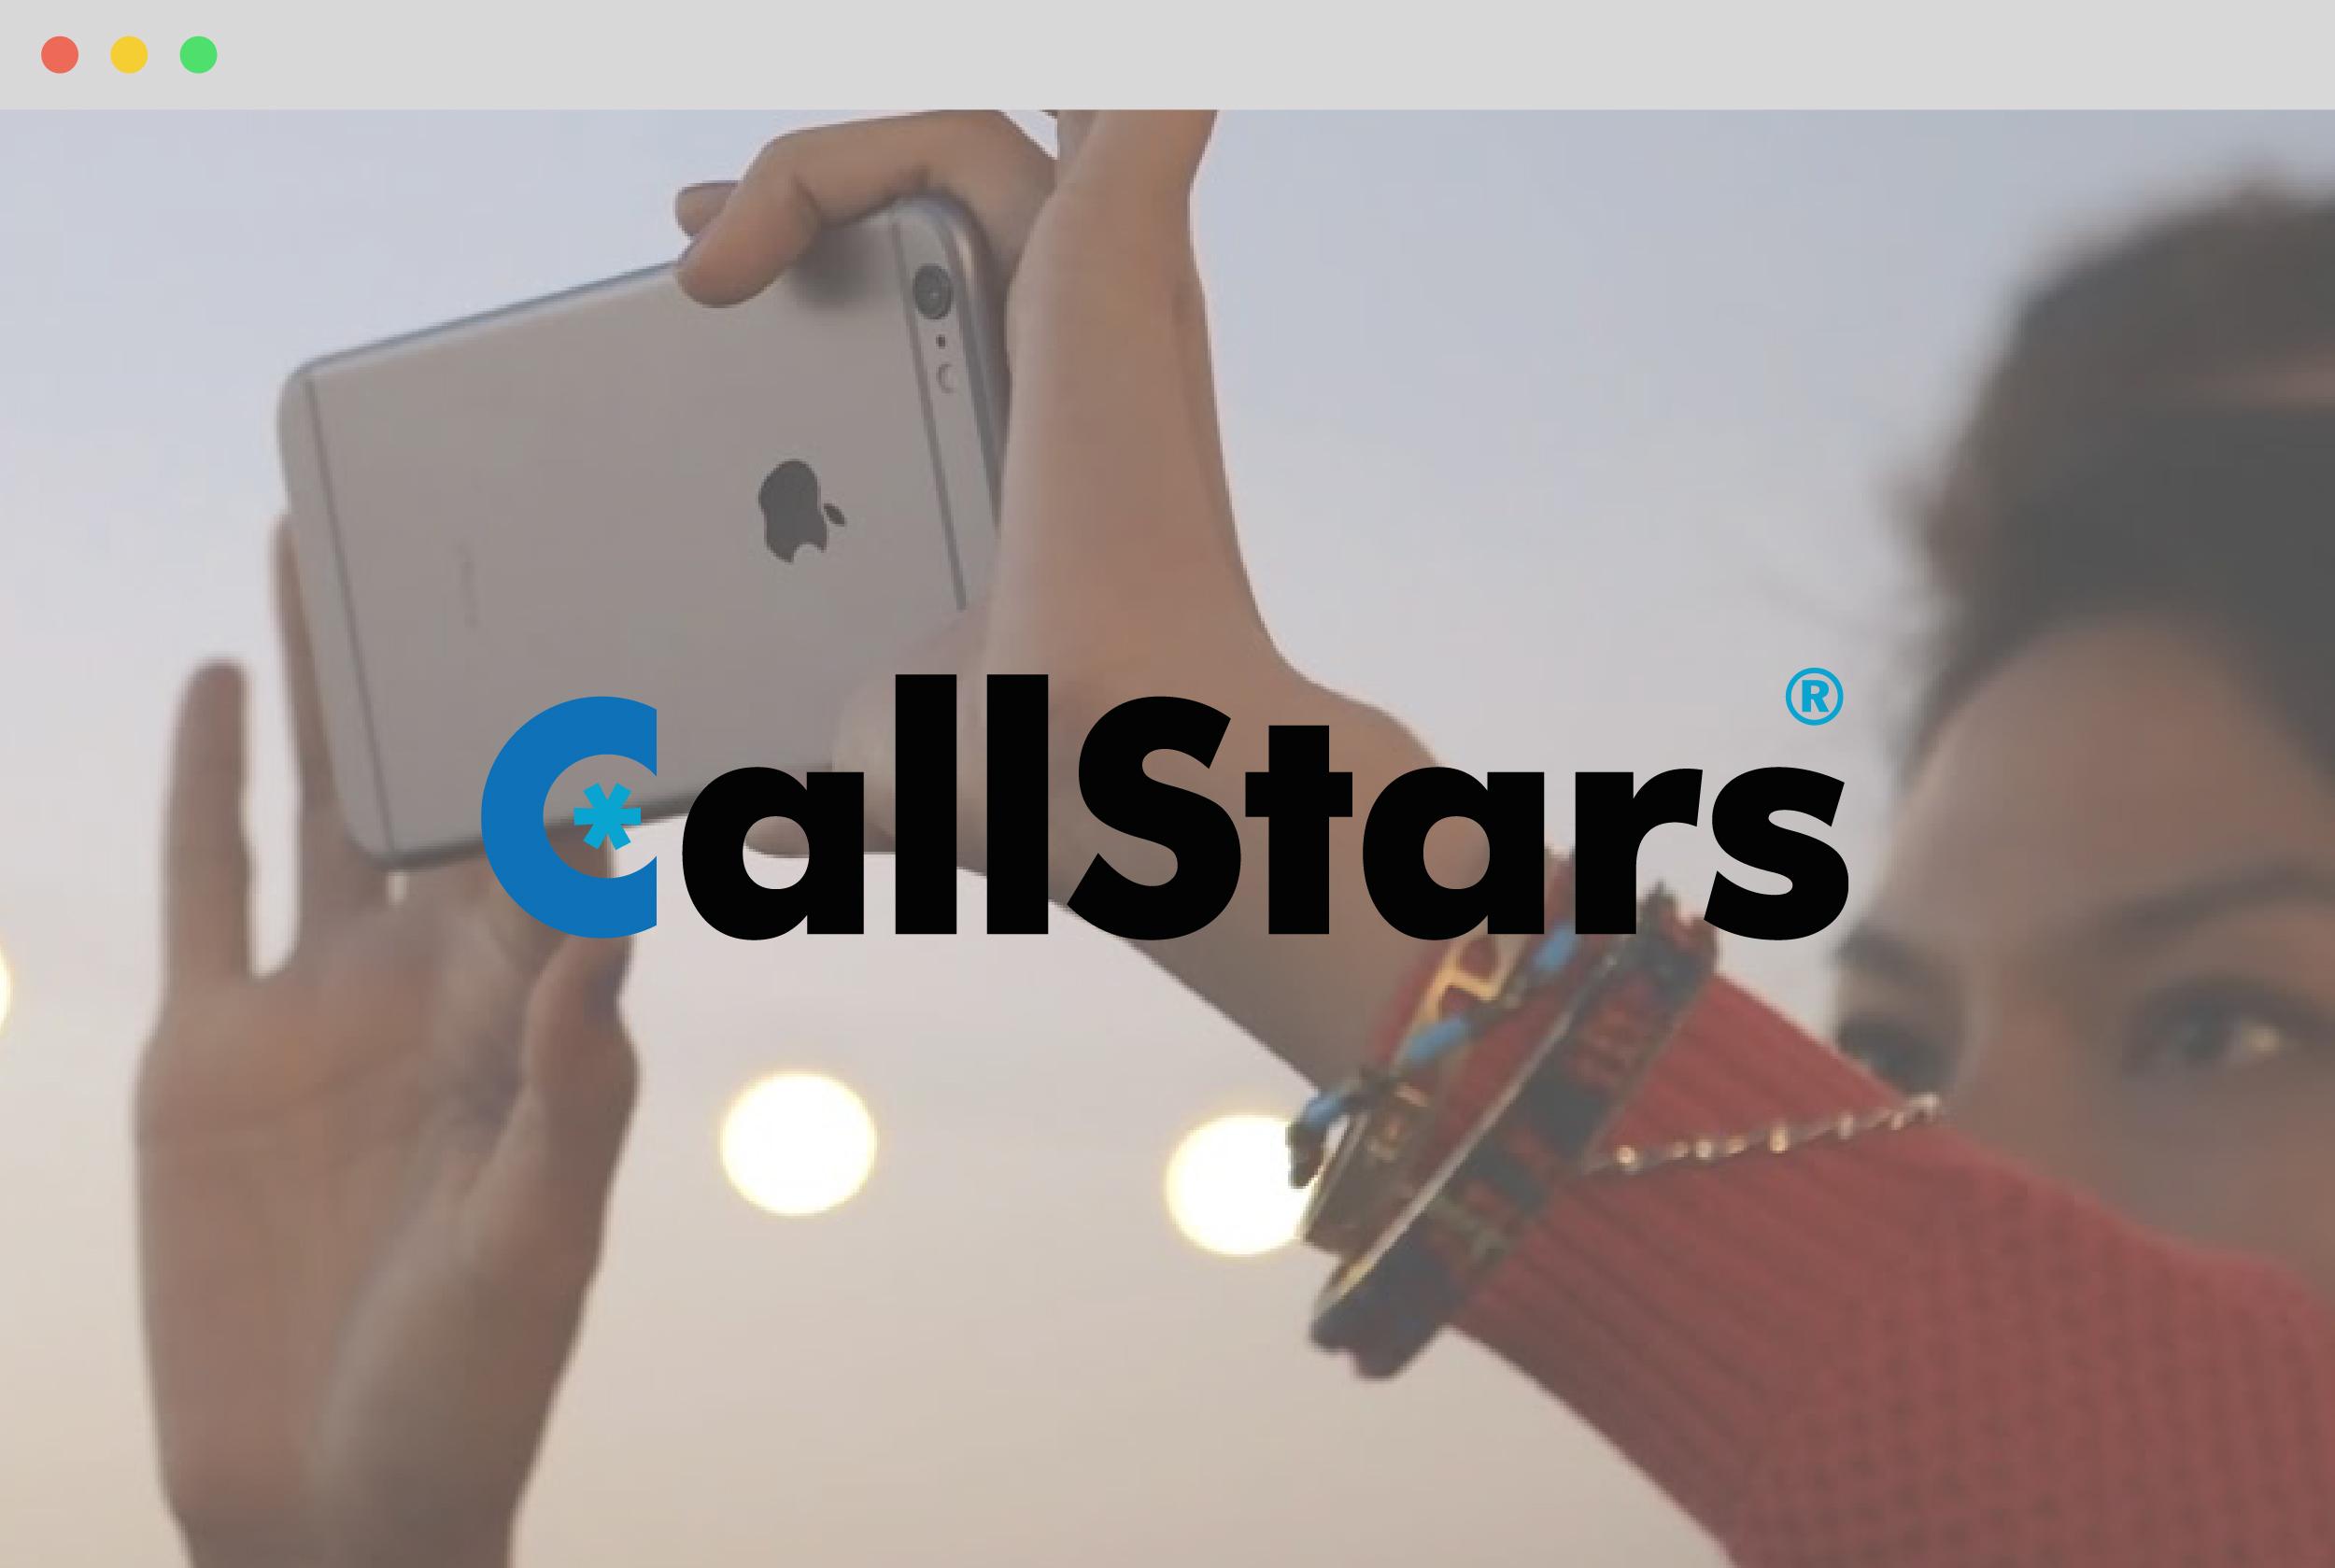 Callstars Refurbished